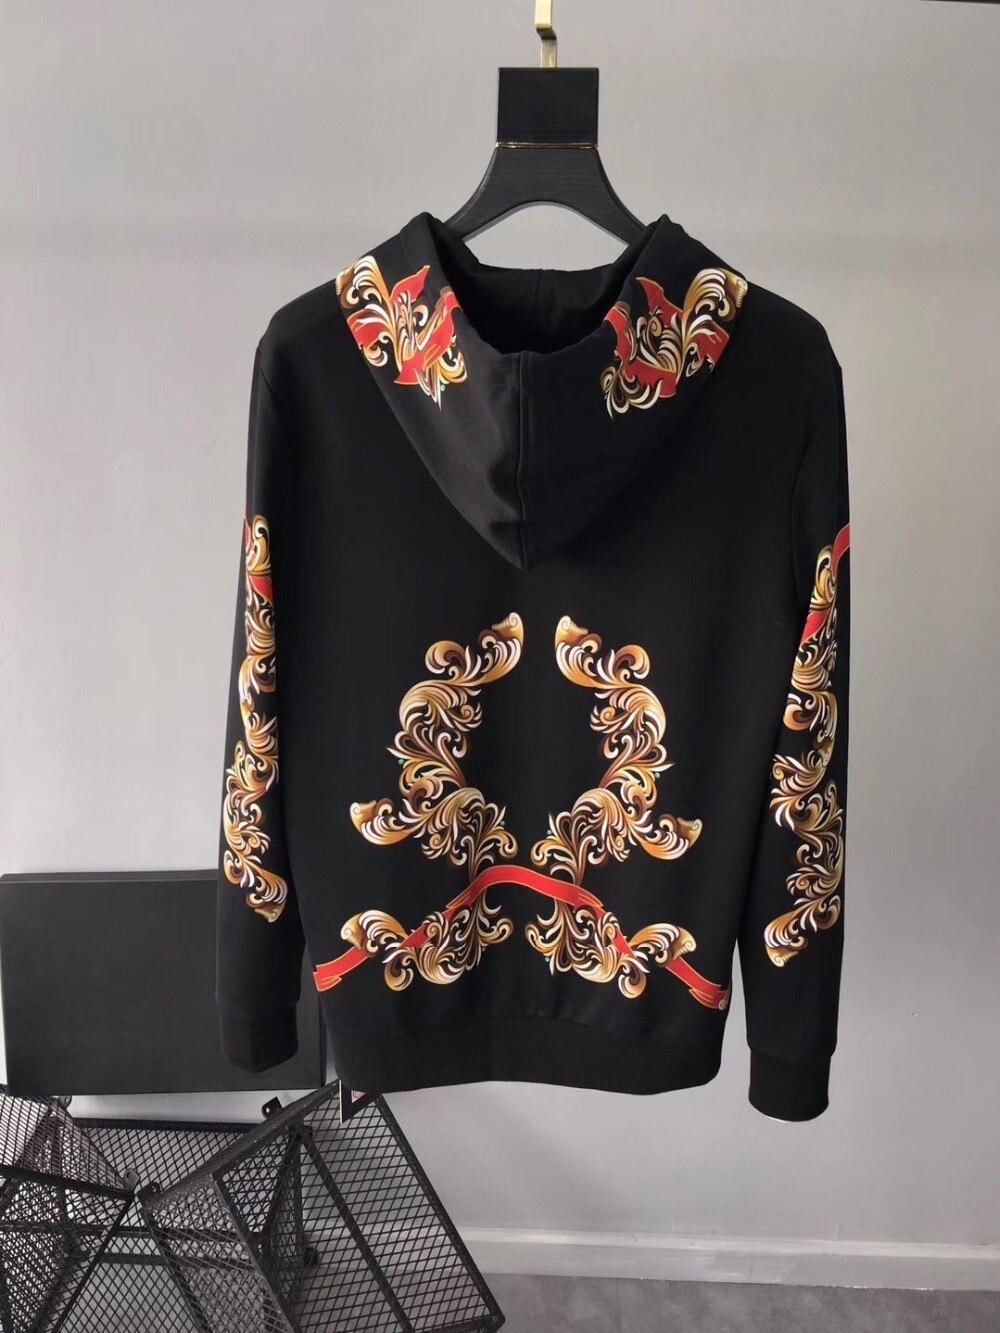 2019 Spring New Fashion Arrival Flower Floral Leopard Print Retro Vintage Sweatshirts Hoodies Men Designer Clothing - 4